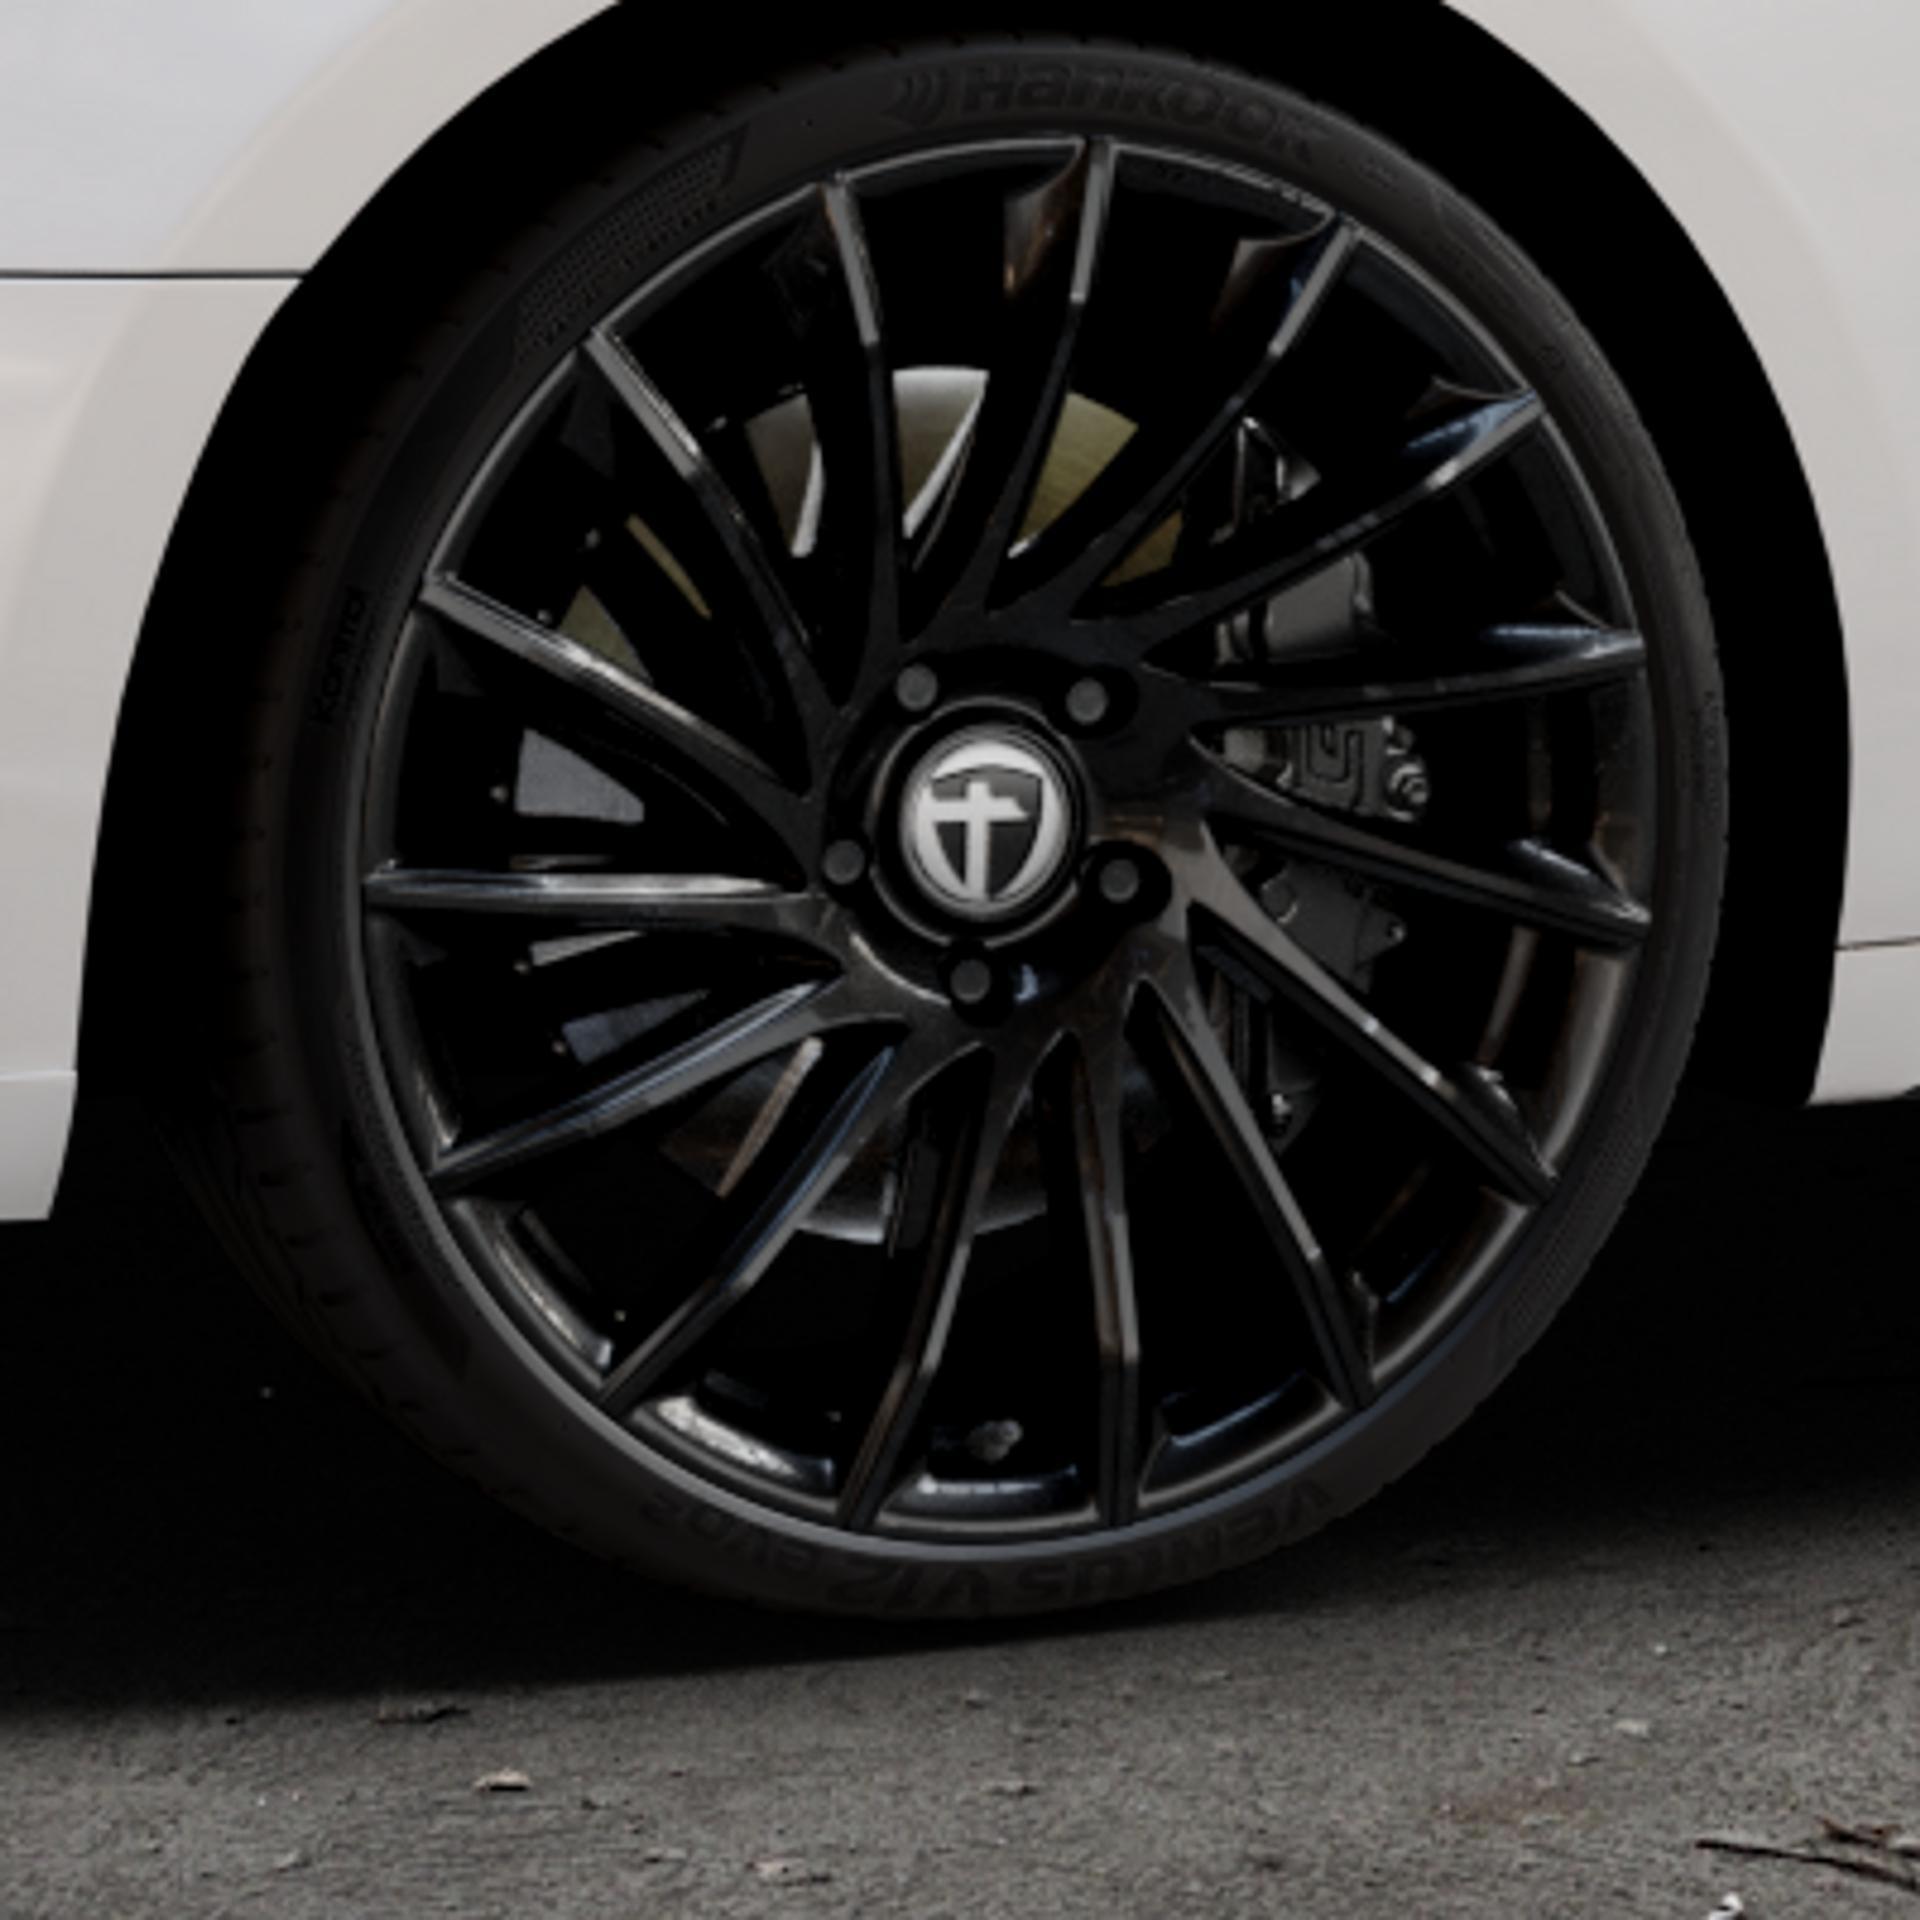 TOMASON TN16 Black painted Felge mit Reifen schwarz in 20Zoll Winterfelge Alufelge auf weissem Audi A5 Typ B9 (Sportback) 2,0l TDI 140kW (190 PS) quattro TFSI 185kW (252 3,0l 160kW (218 200kW (272 1,4l 110kW (150 183kW (249 g-tron 125kW (170 Mild-Hybrid 100kW (136 210kW (286 45 180kW (245 35 40 50 170kW (231 120kW (163 30 ⬇️ mit 15mm Ti